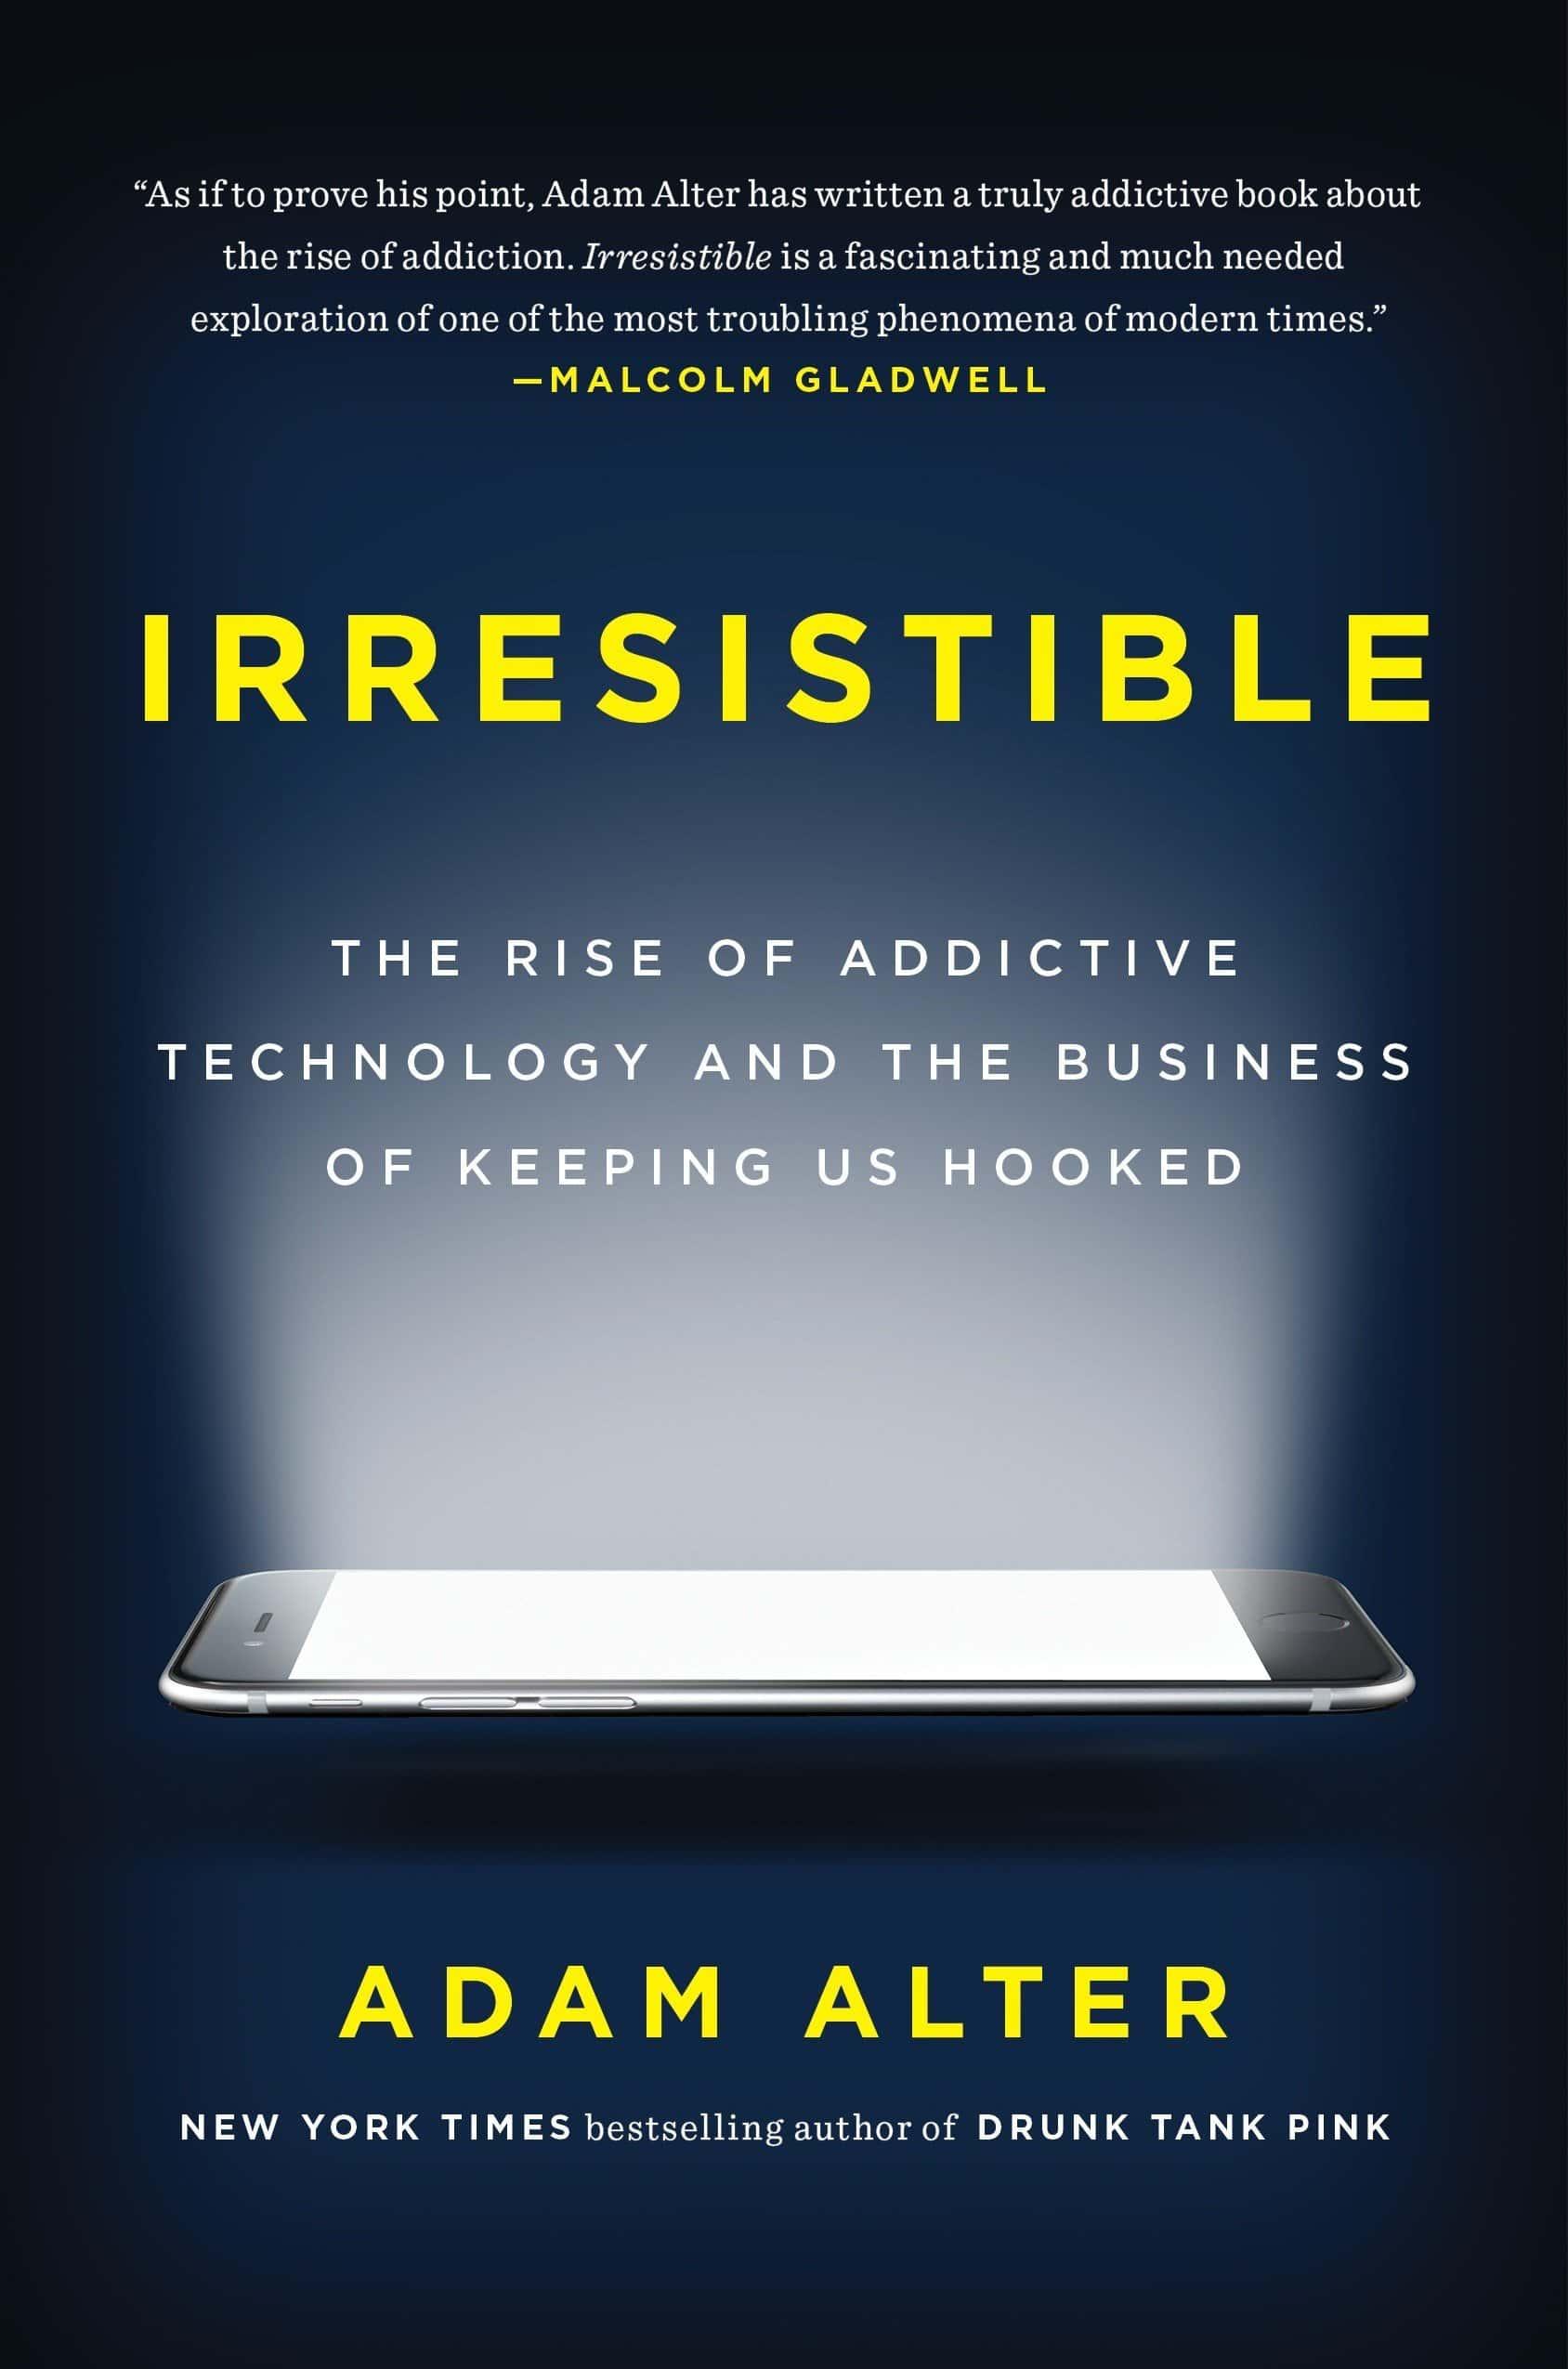 Irresistible: The Rise of Addictive Technology and the Business of Keeping Us Hooked, kirjoittanut Adam Alter - kirjan kansikuva